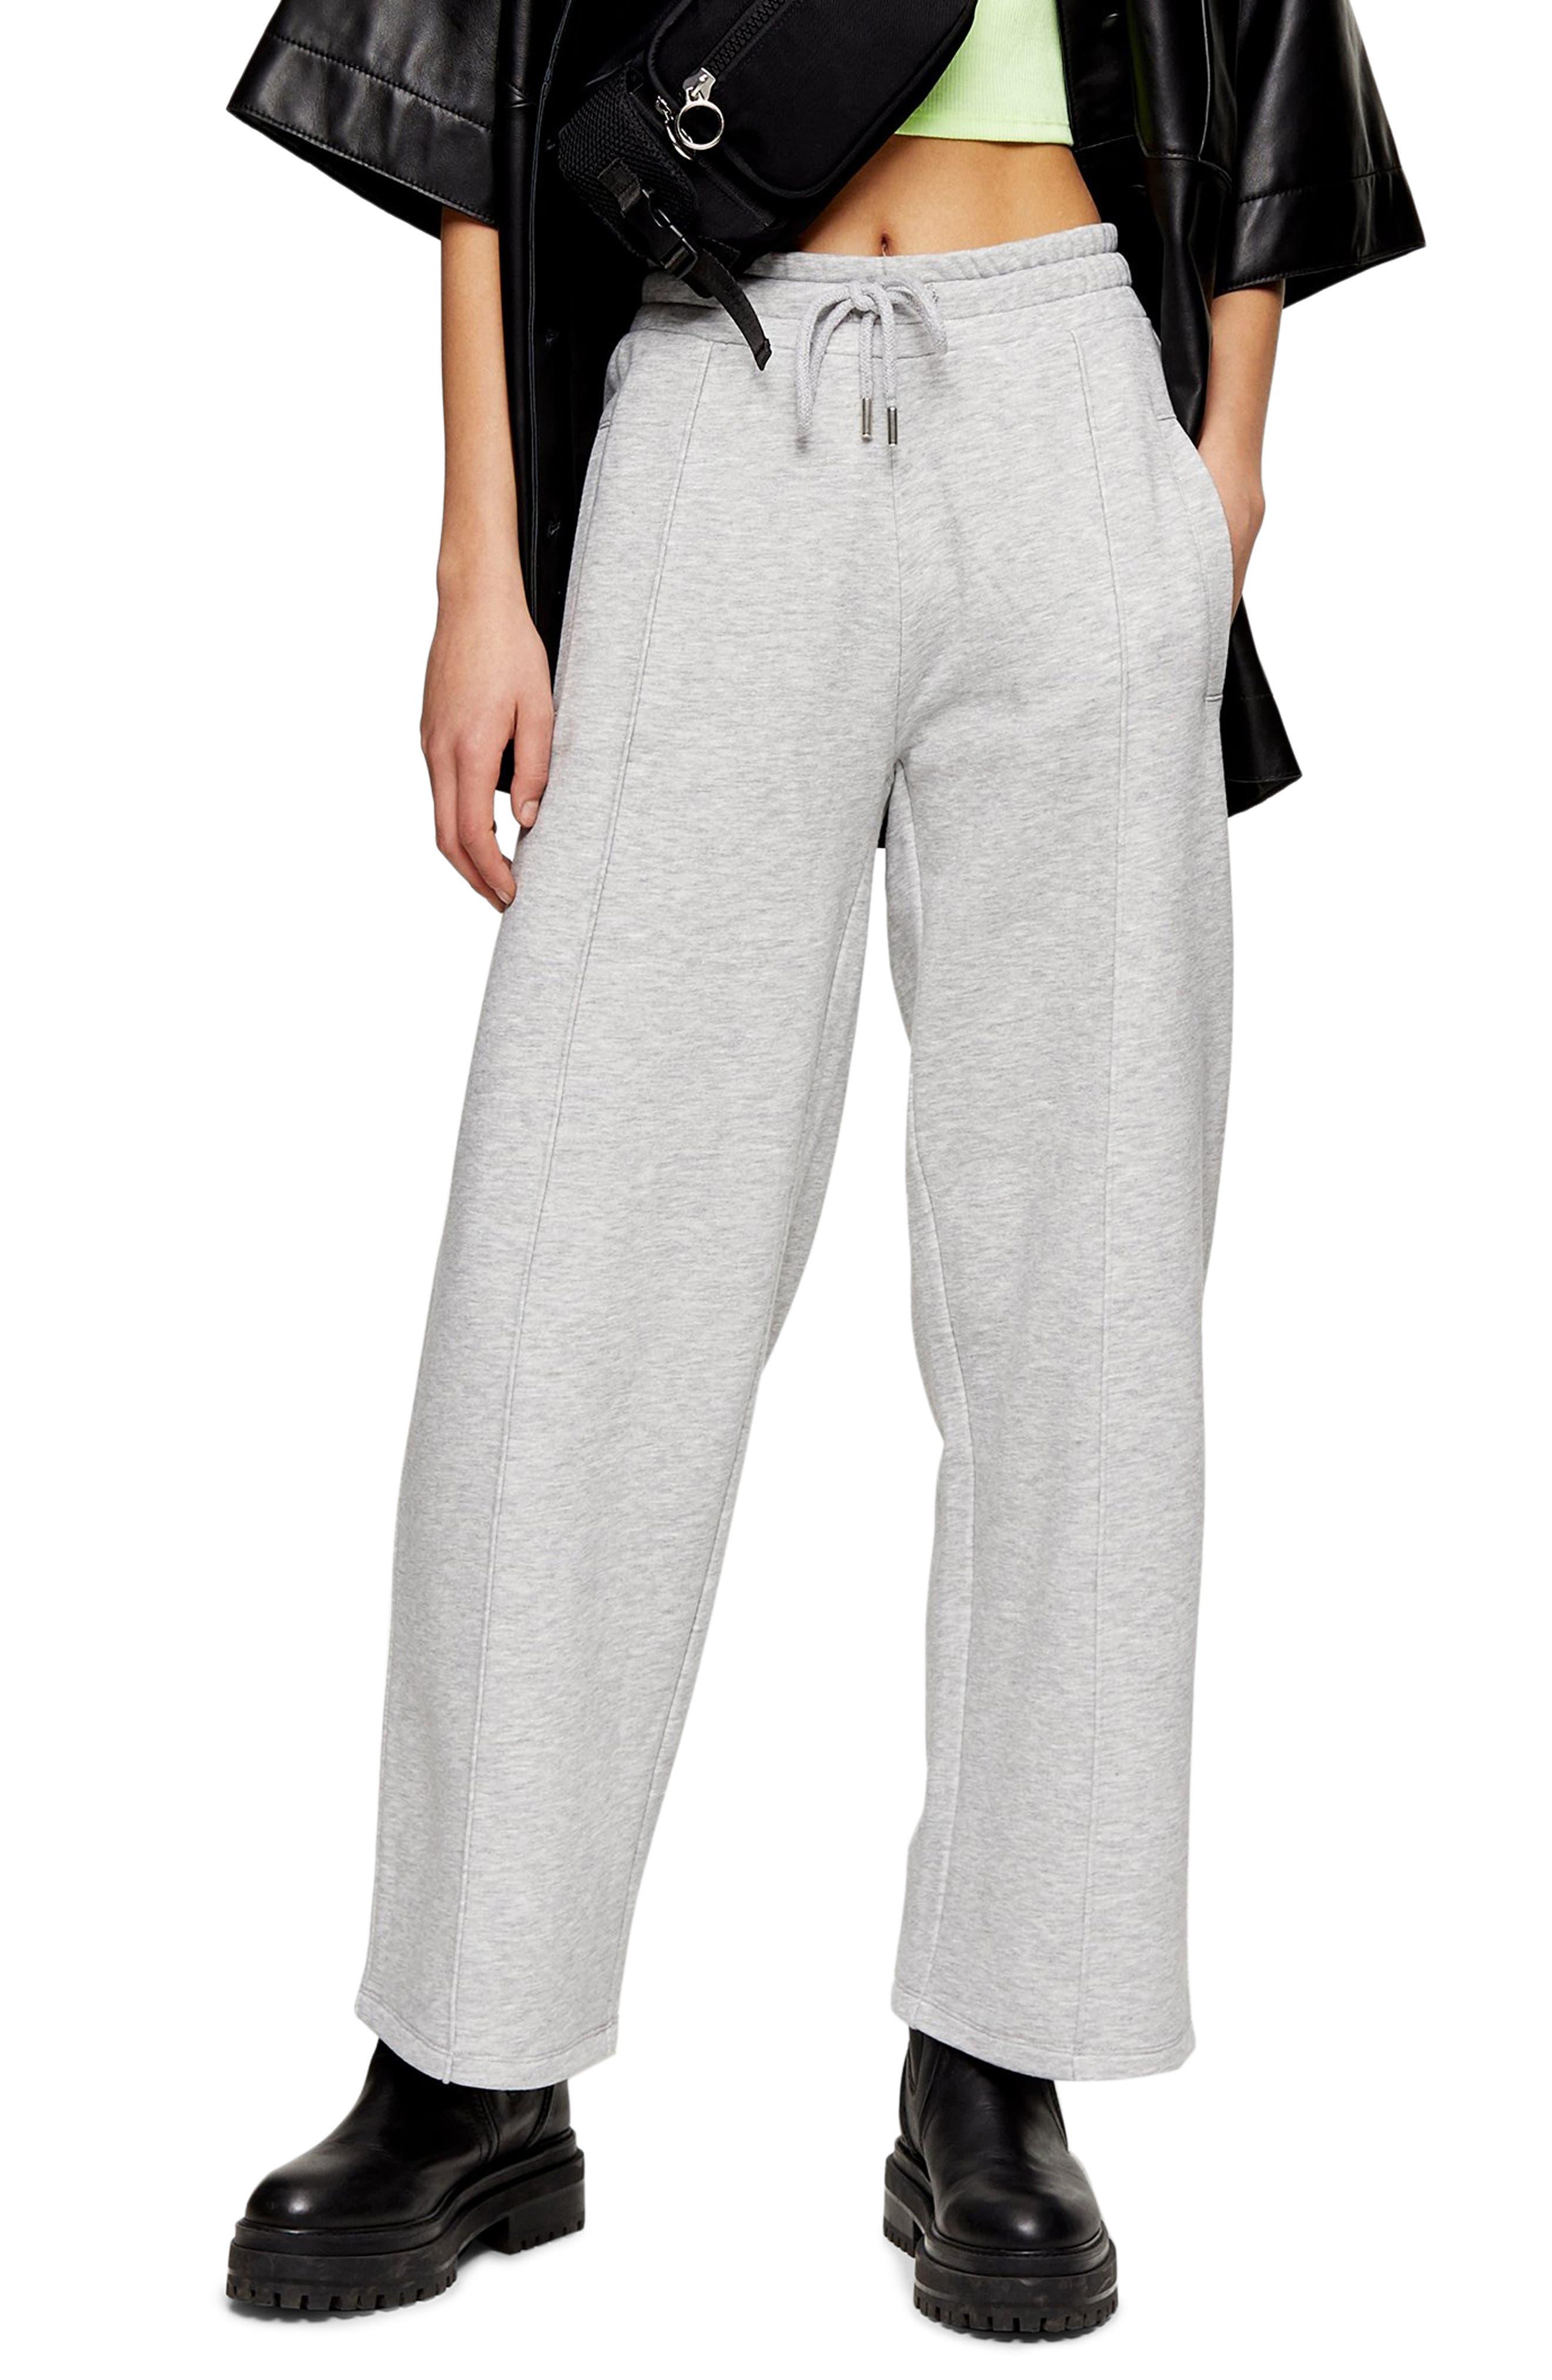 Petite Women's Topshop Wide Leg Sweatpants